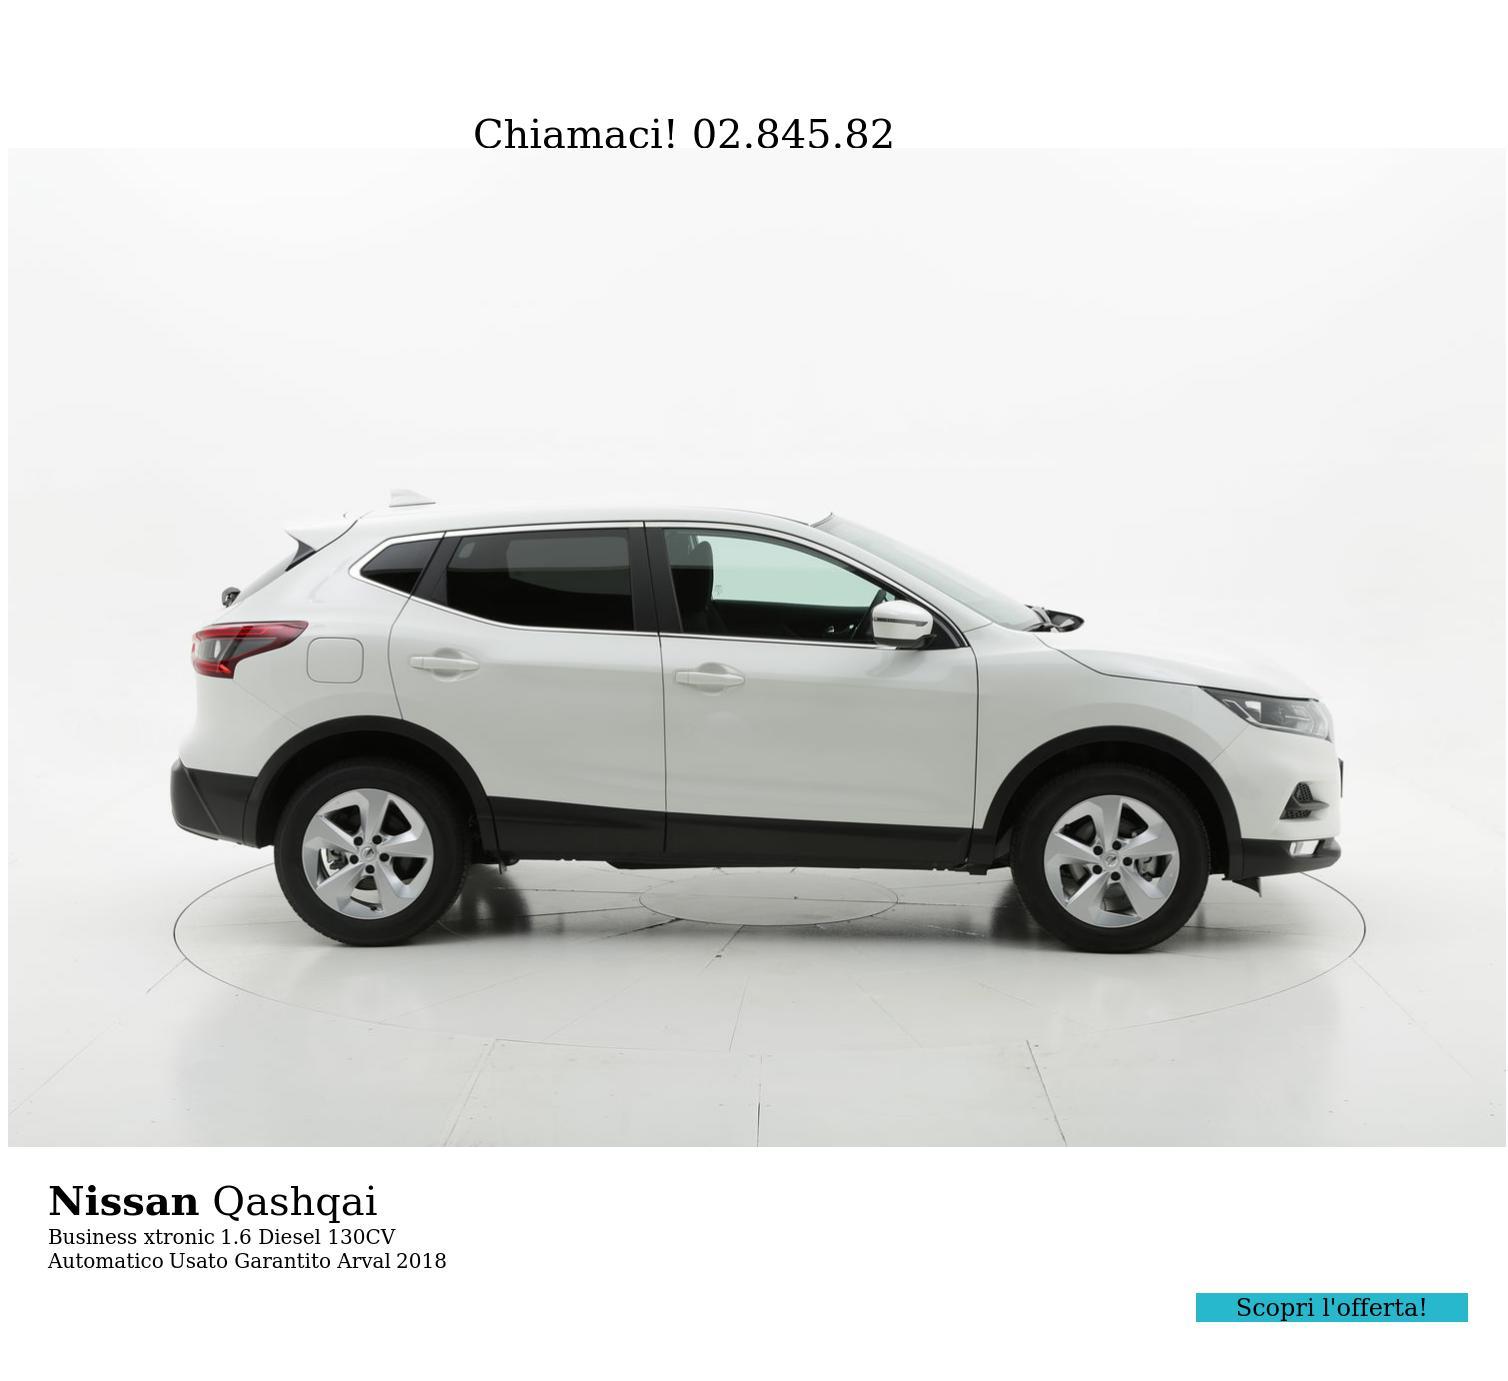 Nissan Qashqai Business xtronic km 0 diesel bianca   brumbrum